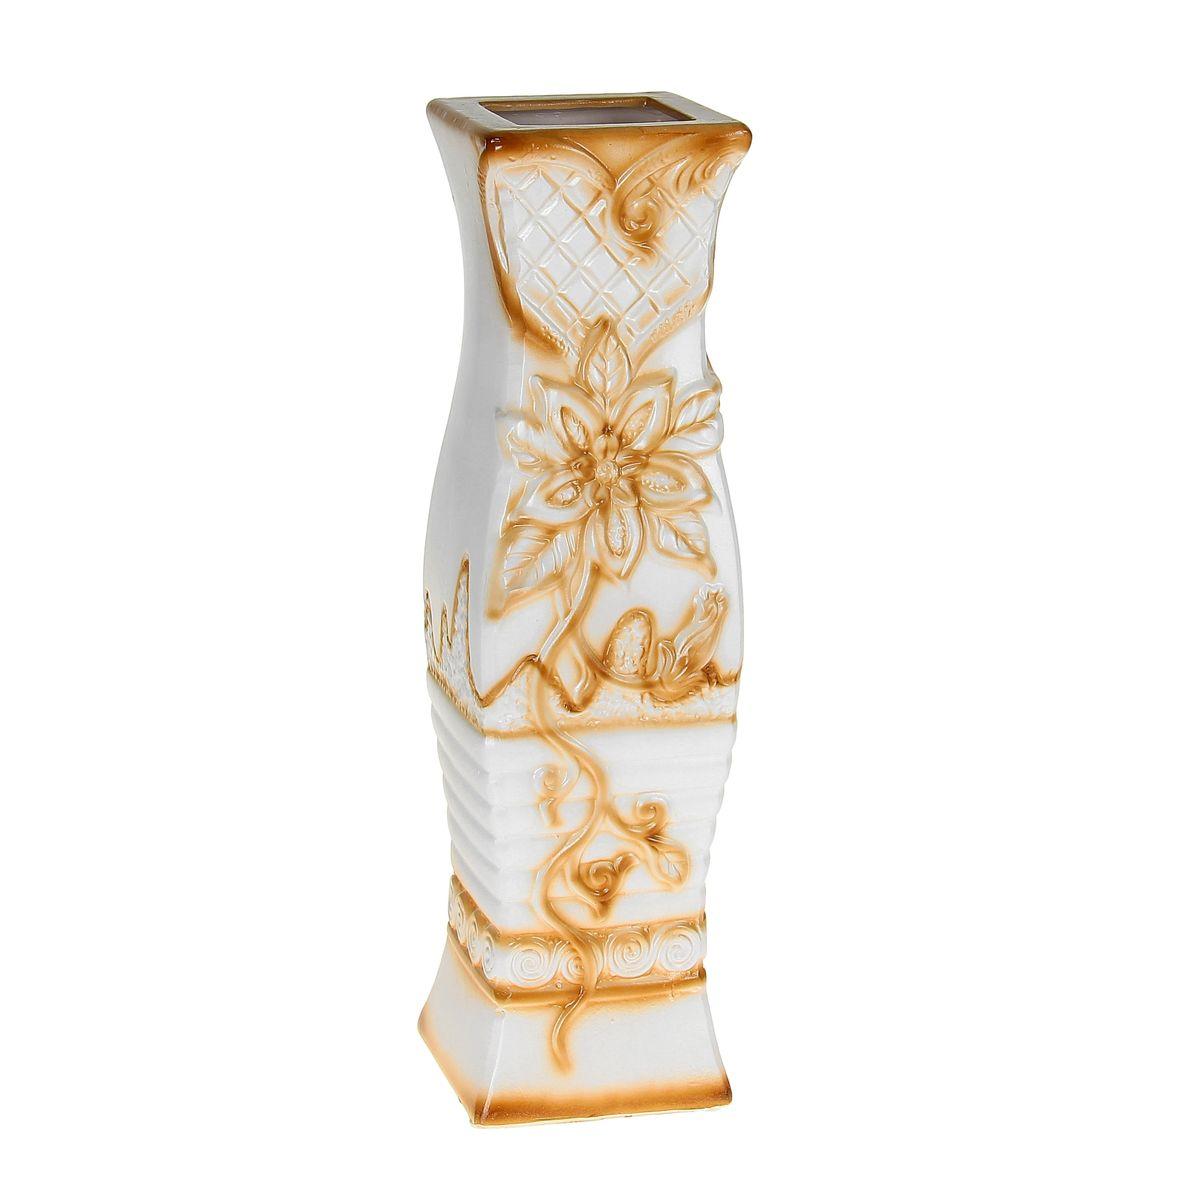 Ваза Цветущая лилия, напольная, высота 60 см. 1044984 ваза керамика напольная 60 см цветущая лилия 1044984